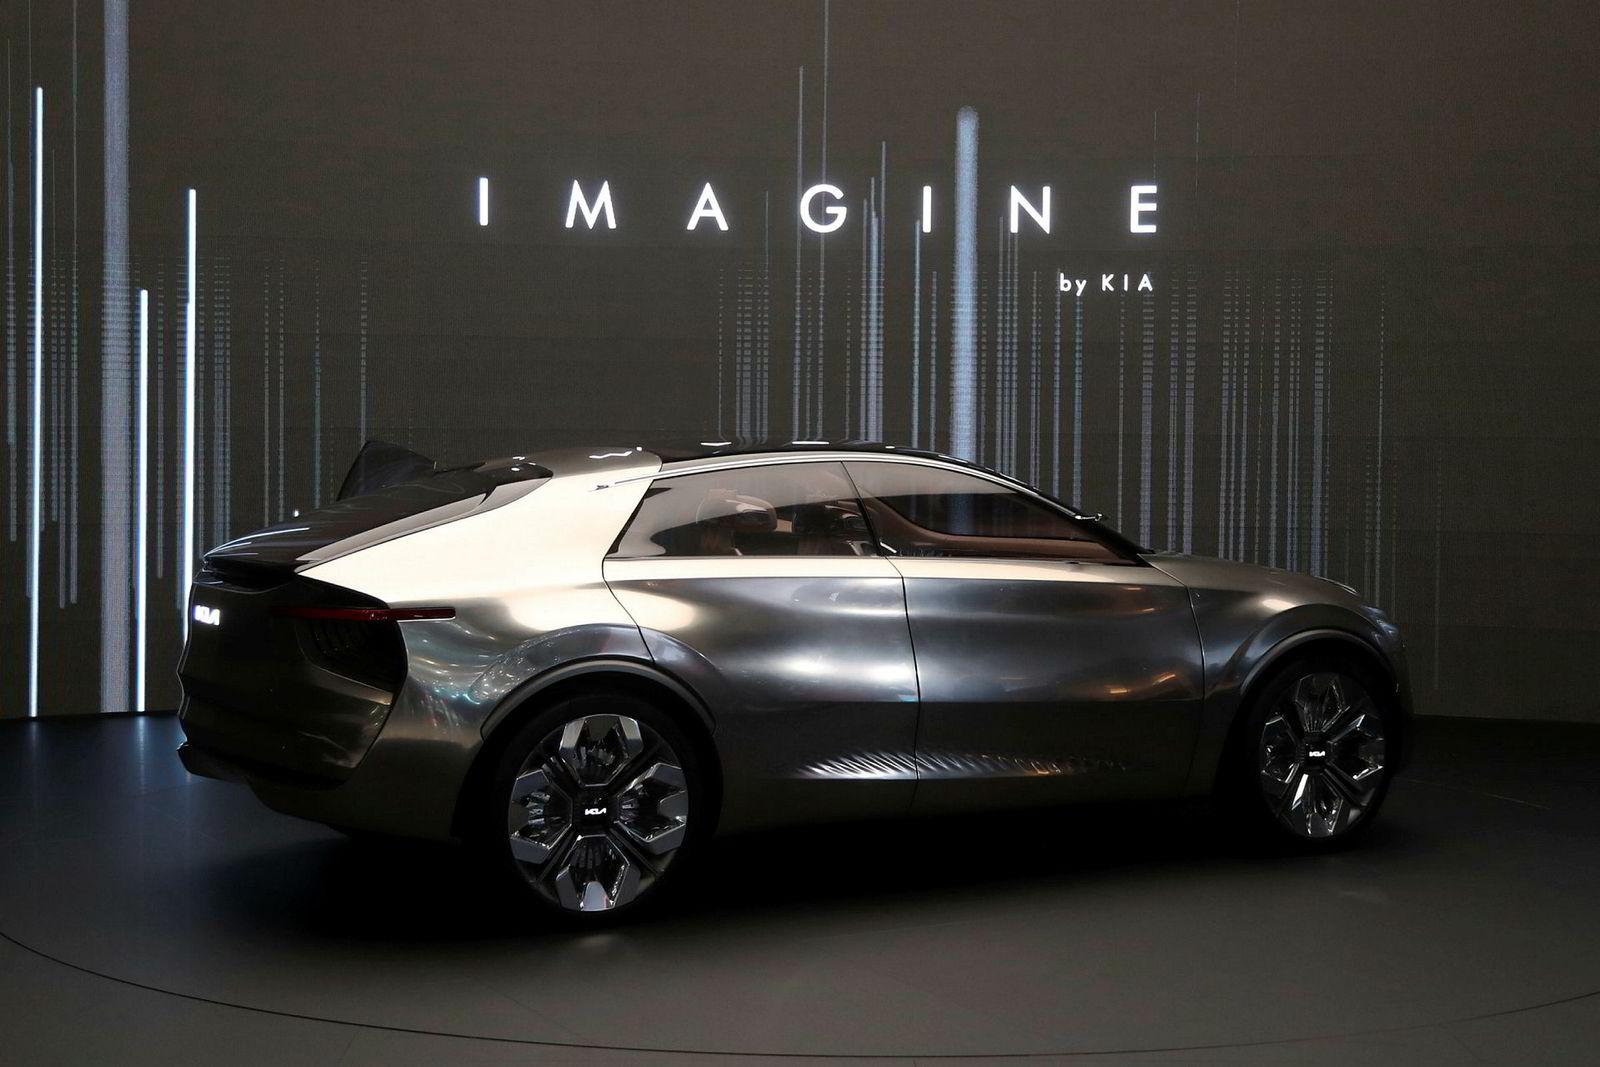 Kia «Imagine by Kia» i Genève 2019.